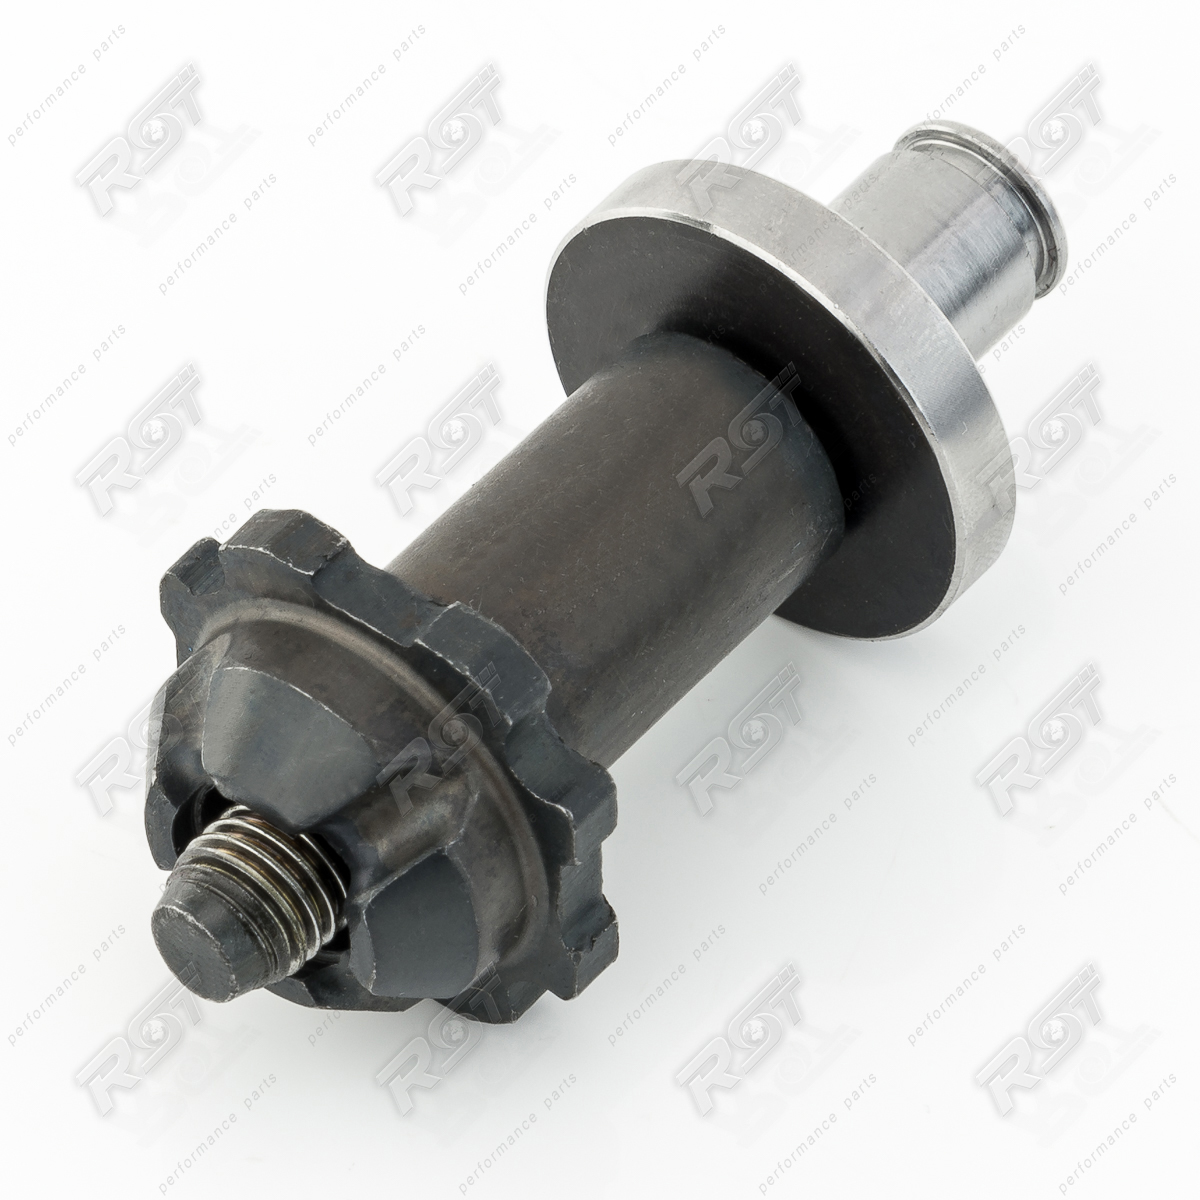 Adapter Screw 12 Seitiger Torx For Actuator Handbrake Epb